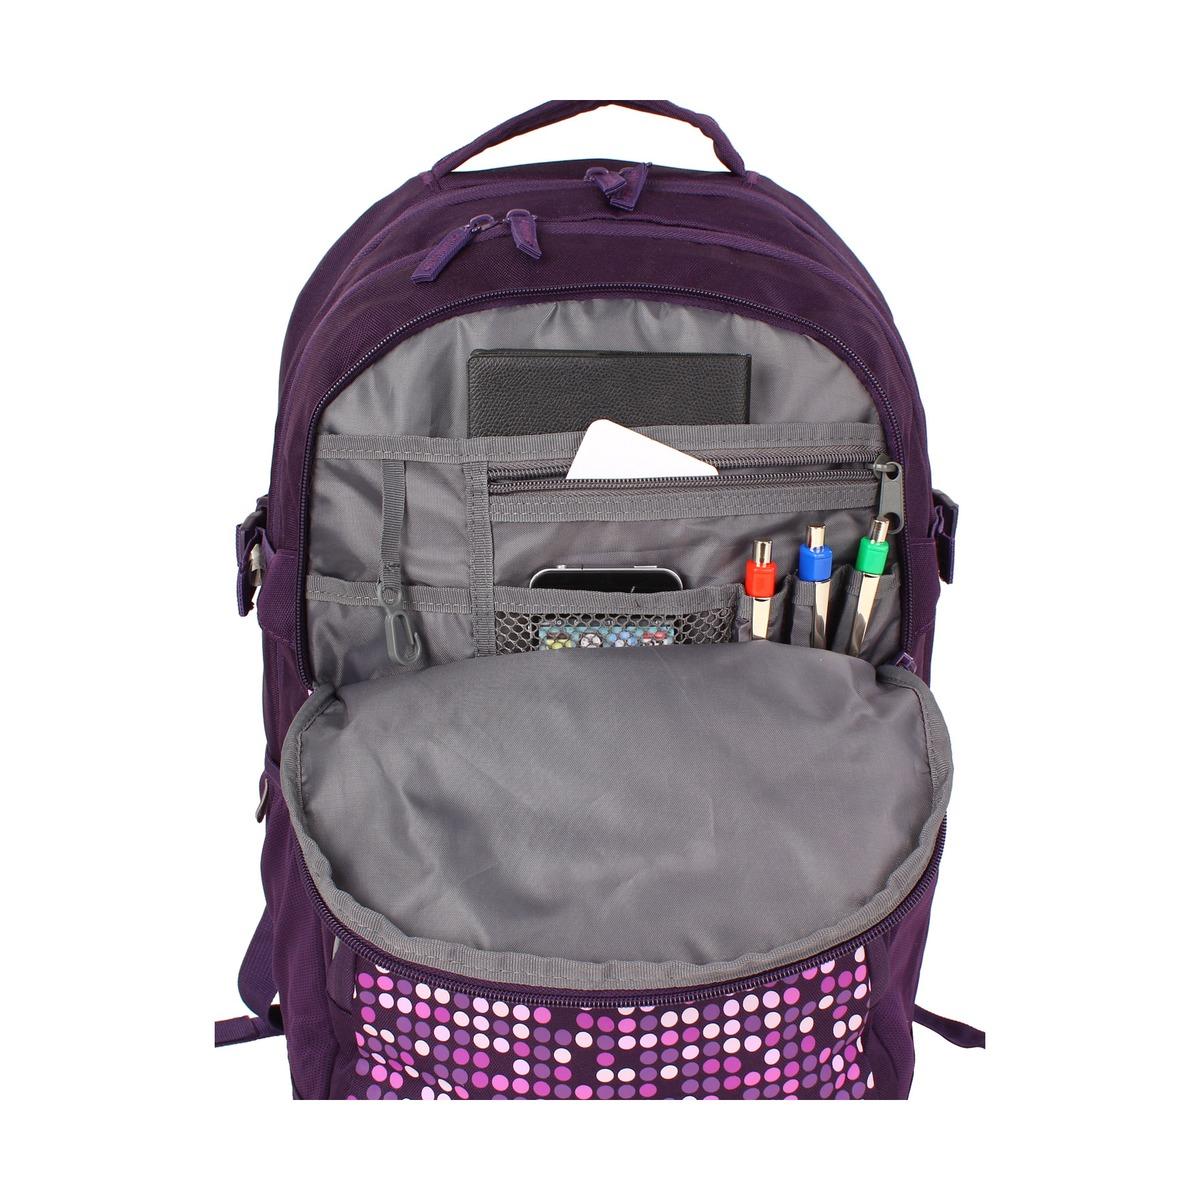 Рюкзак be.bag fashionista рюкзак колибри color me mine simba toys